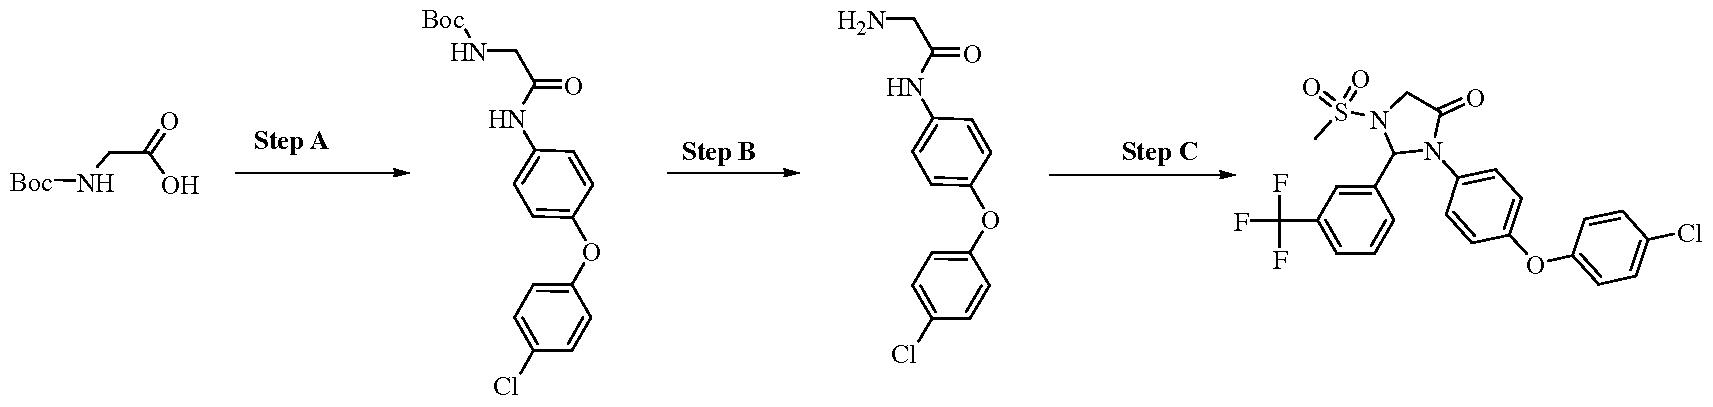 fluoxetine and wellbutrin